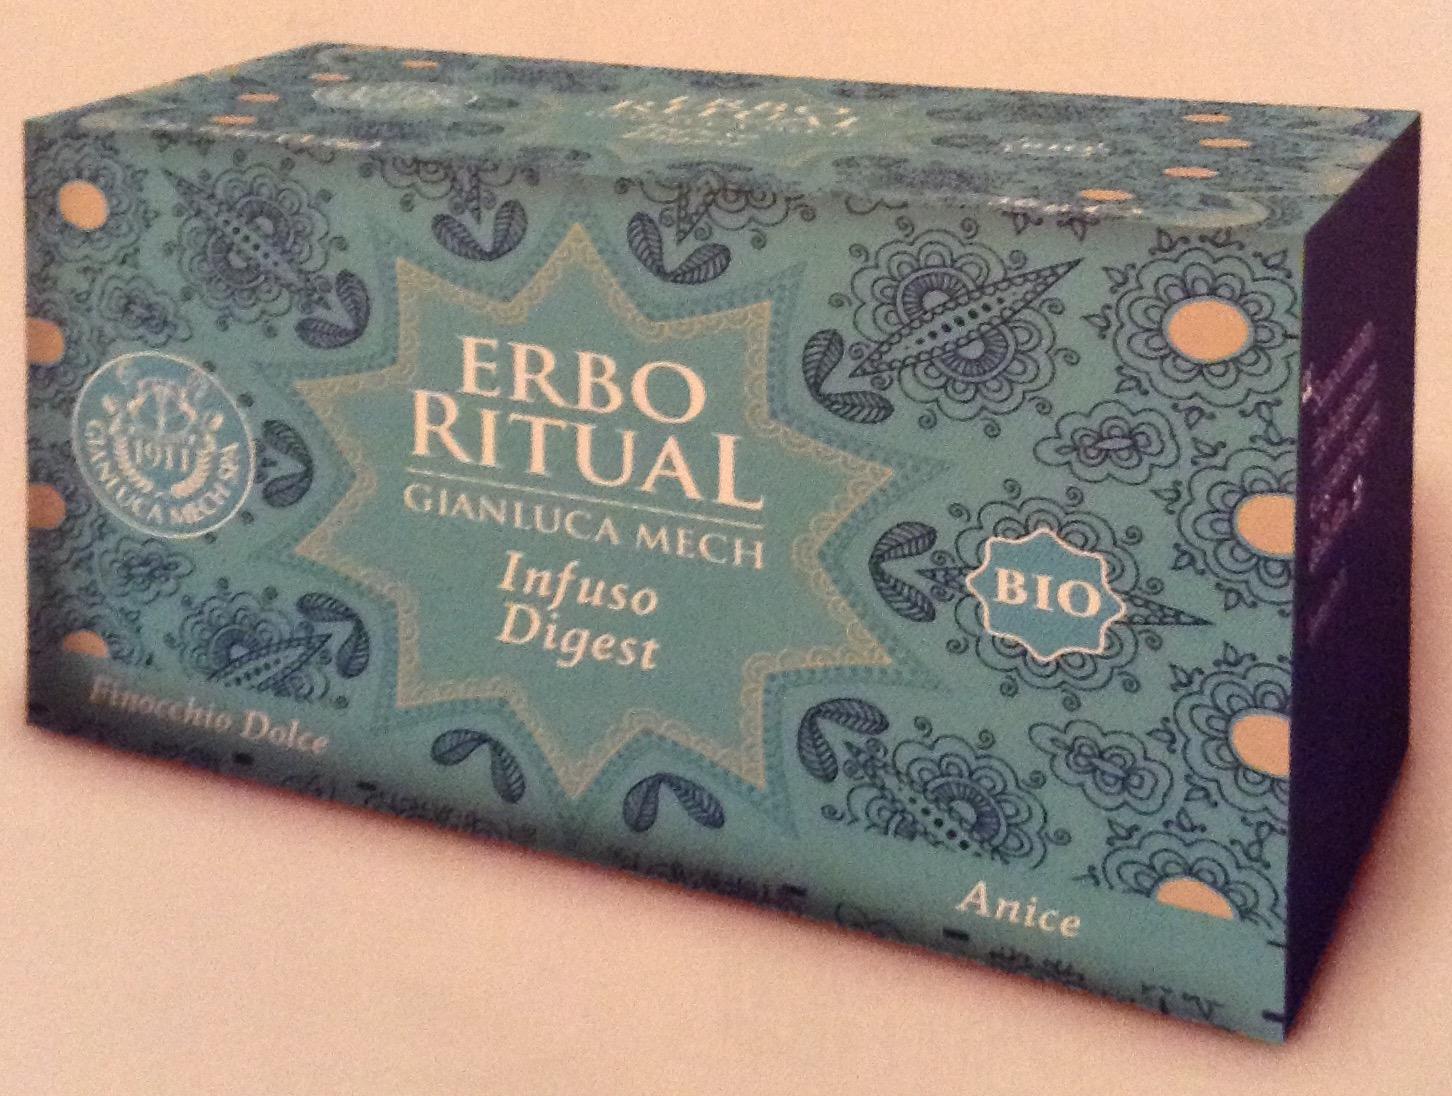 Erbo Ritual Infuso Digest